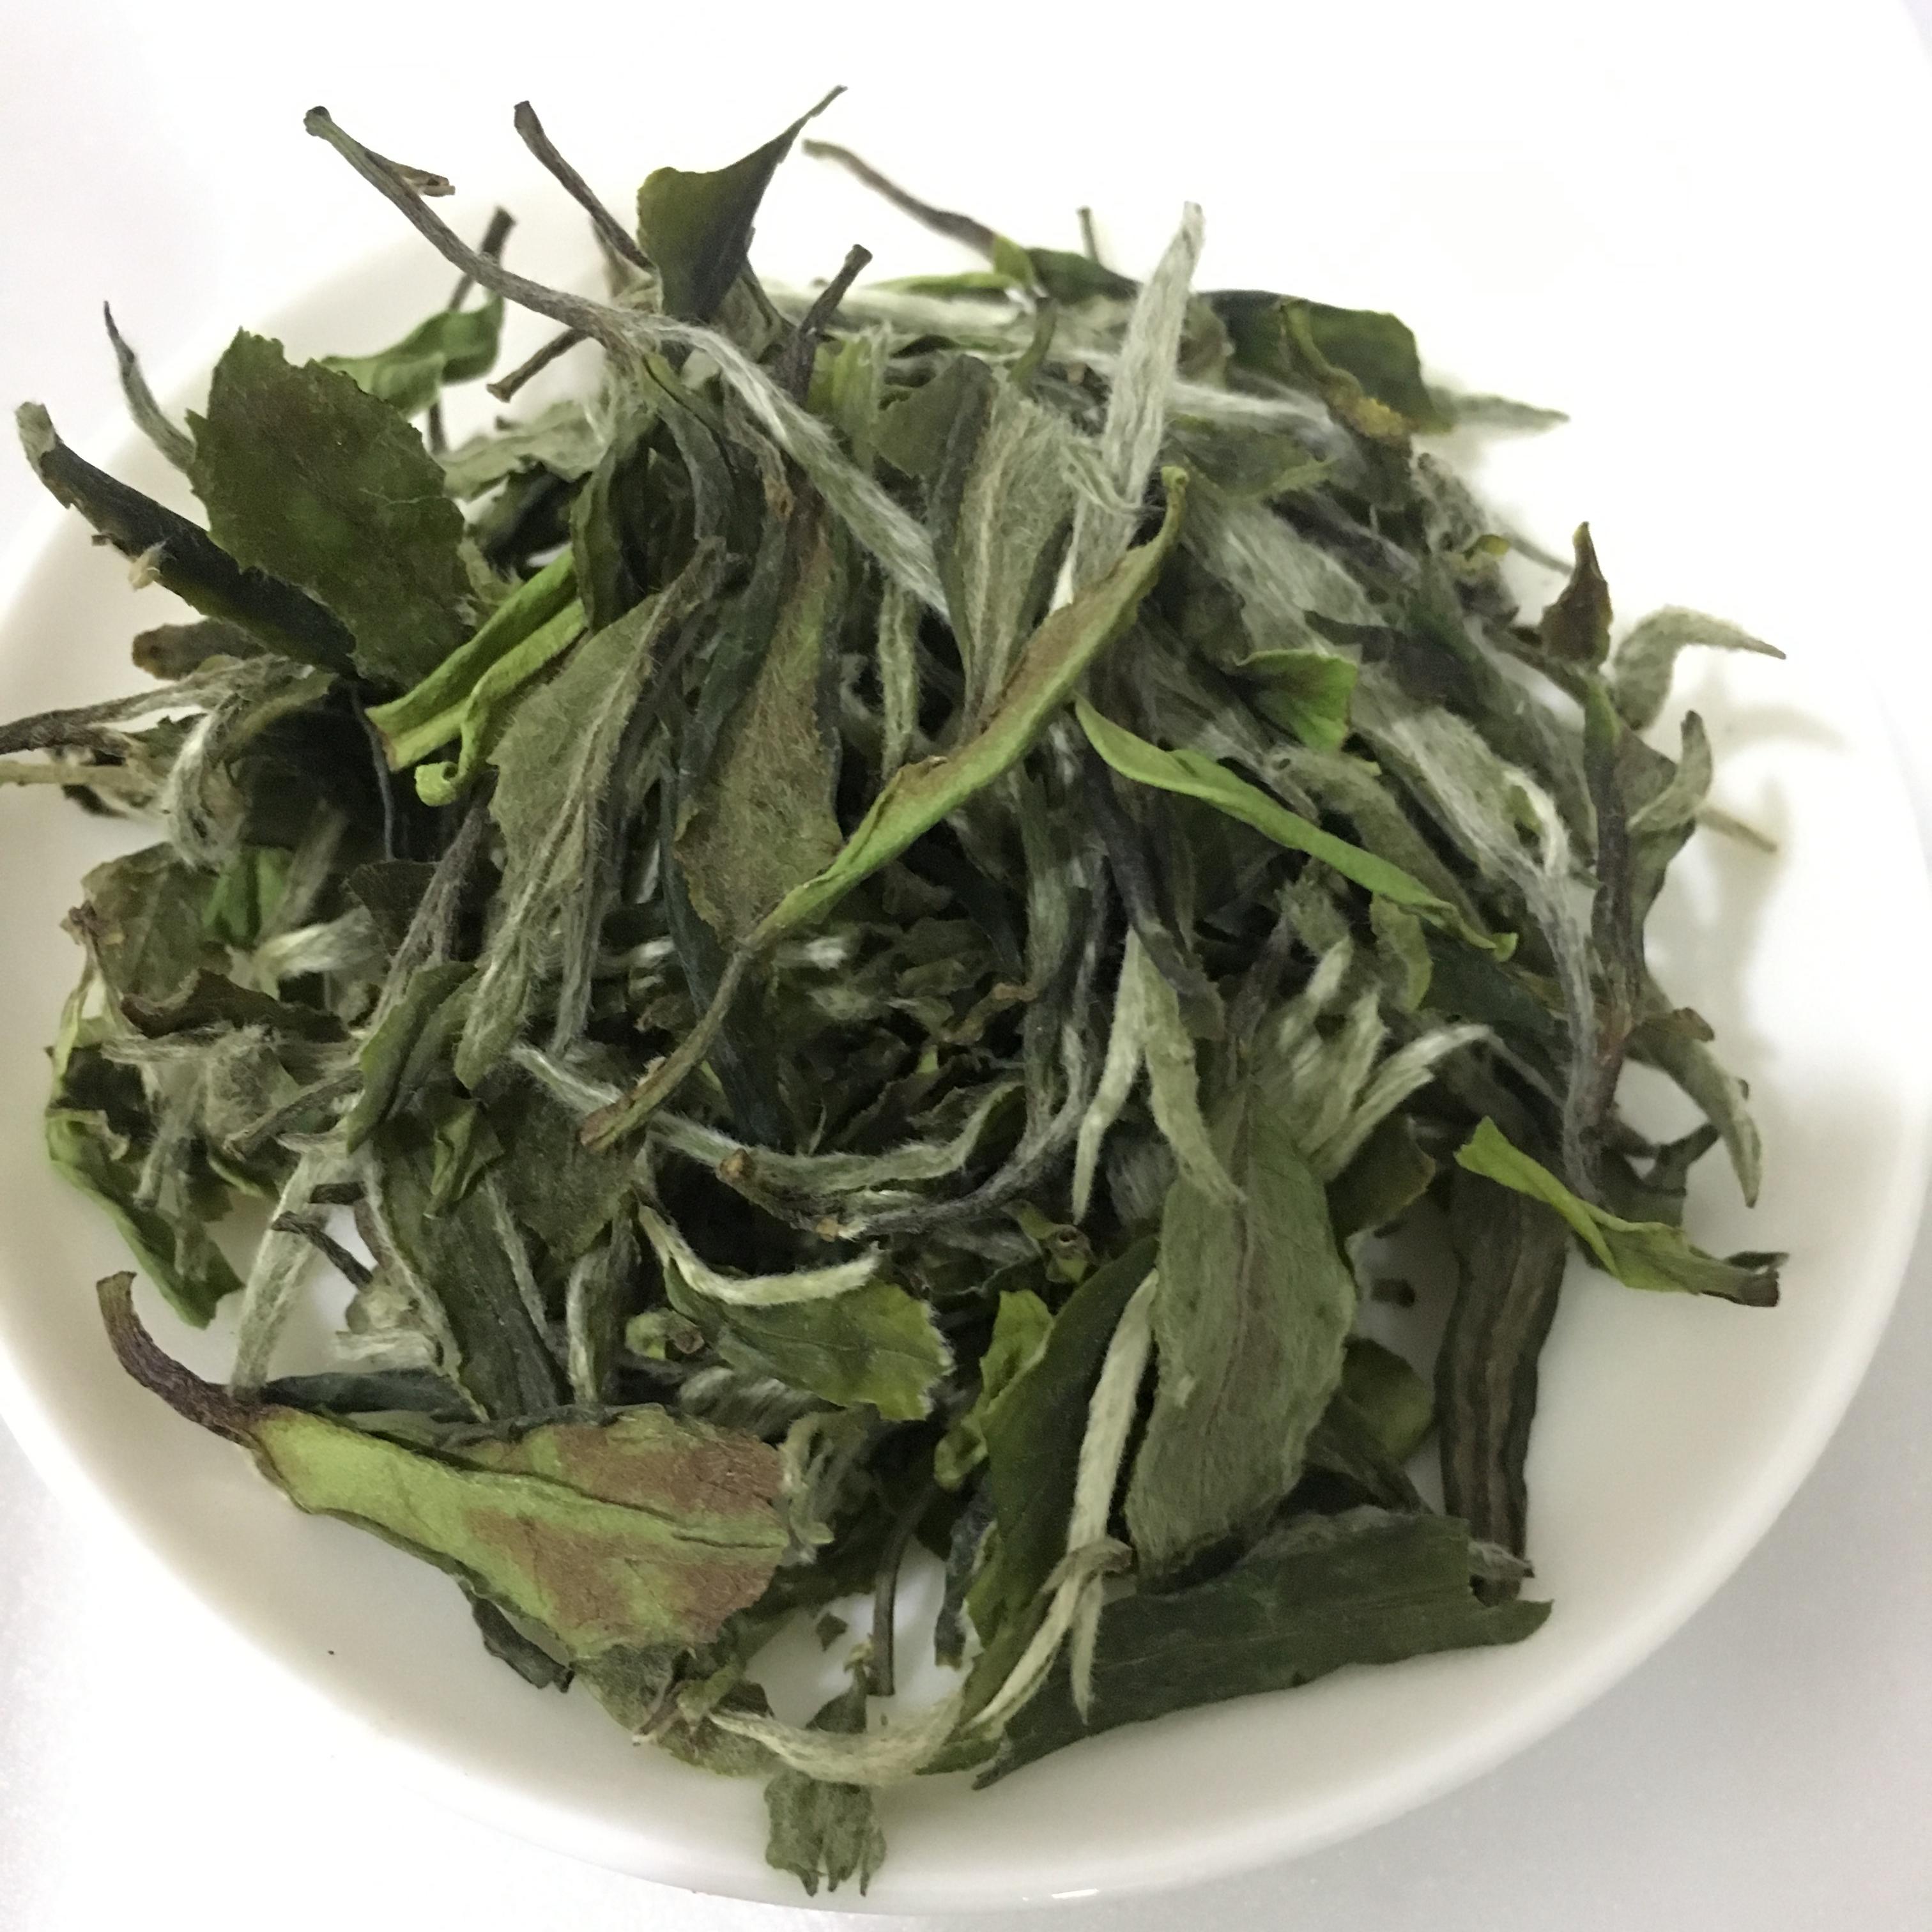 High quality organic white peony bai mu dan loose tea leaf - 4uTea | 4uTea.com